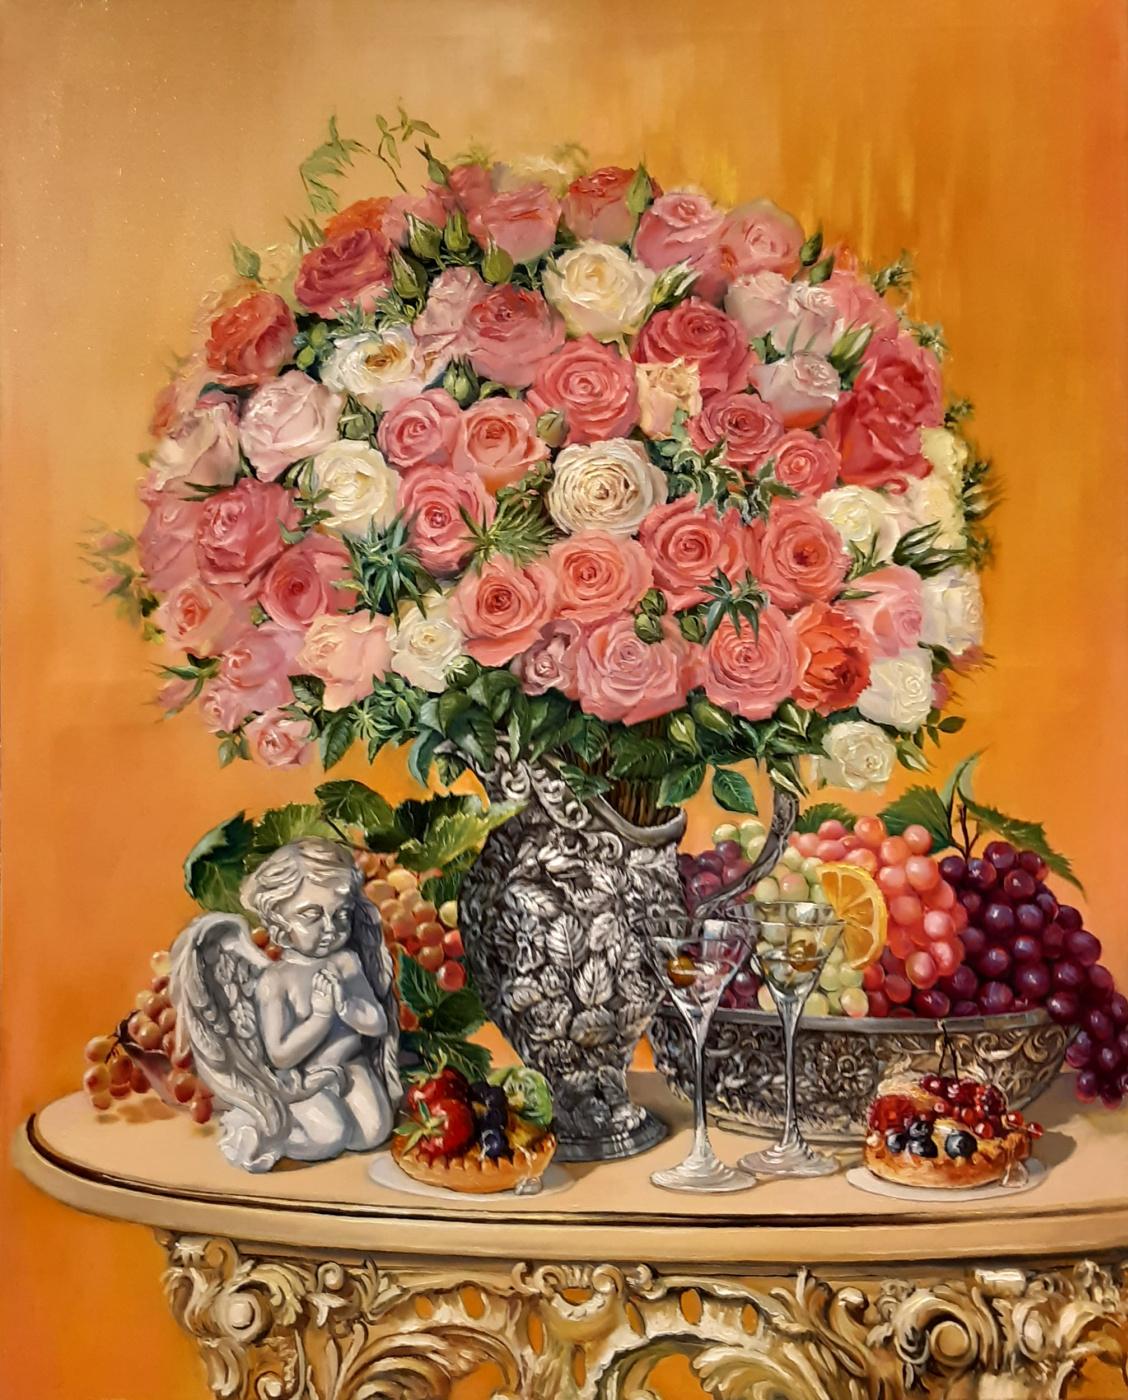 Evgeny Vladimirovich Terentyev. Bouquet with an angel 4